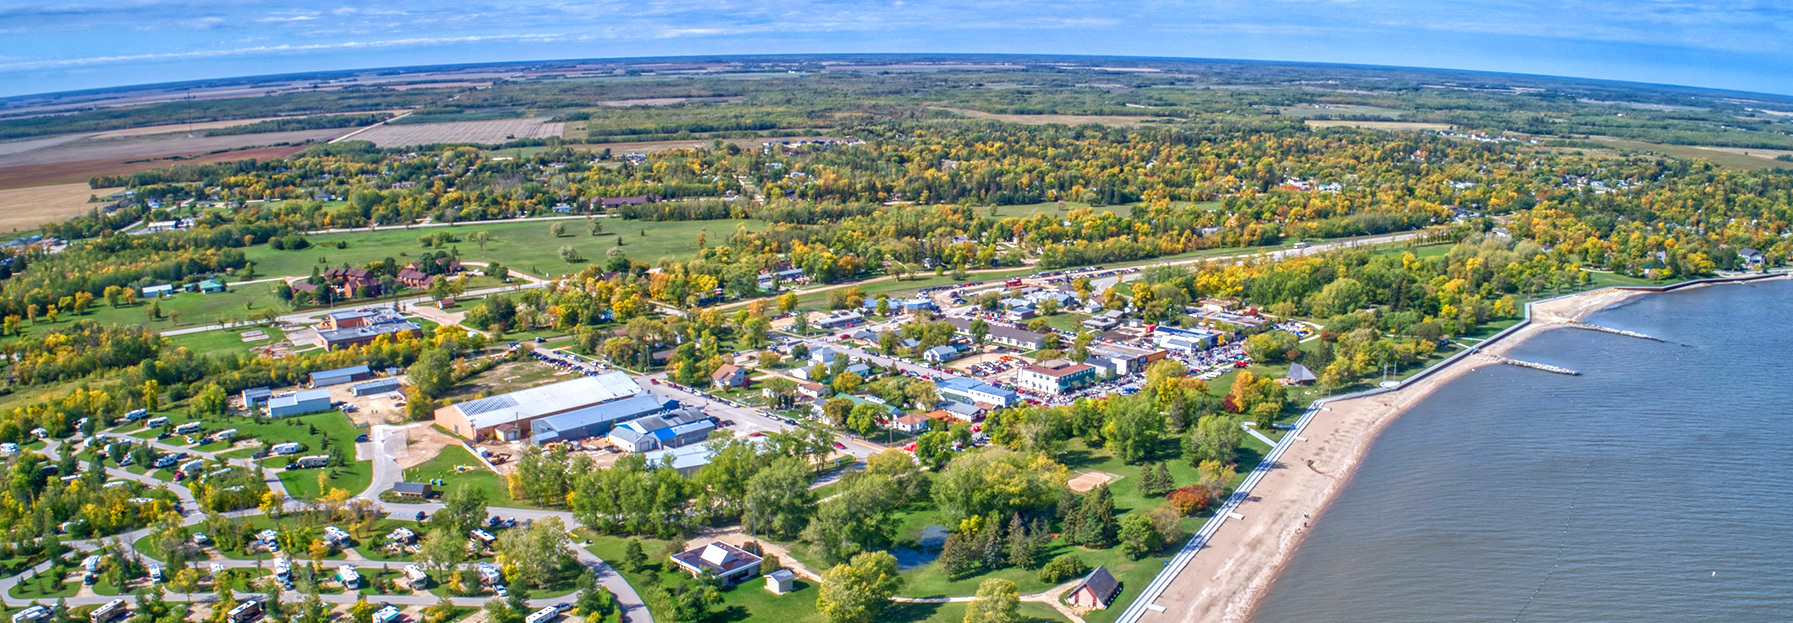 Southern Manitoba Skyline Image